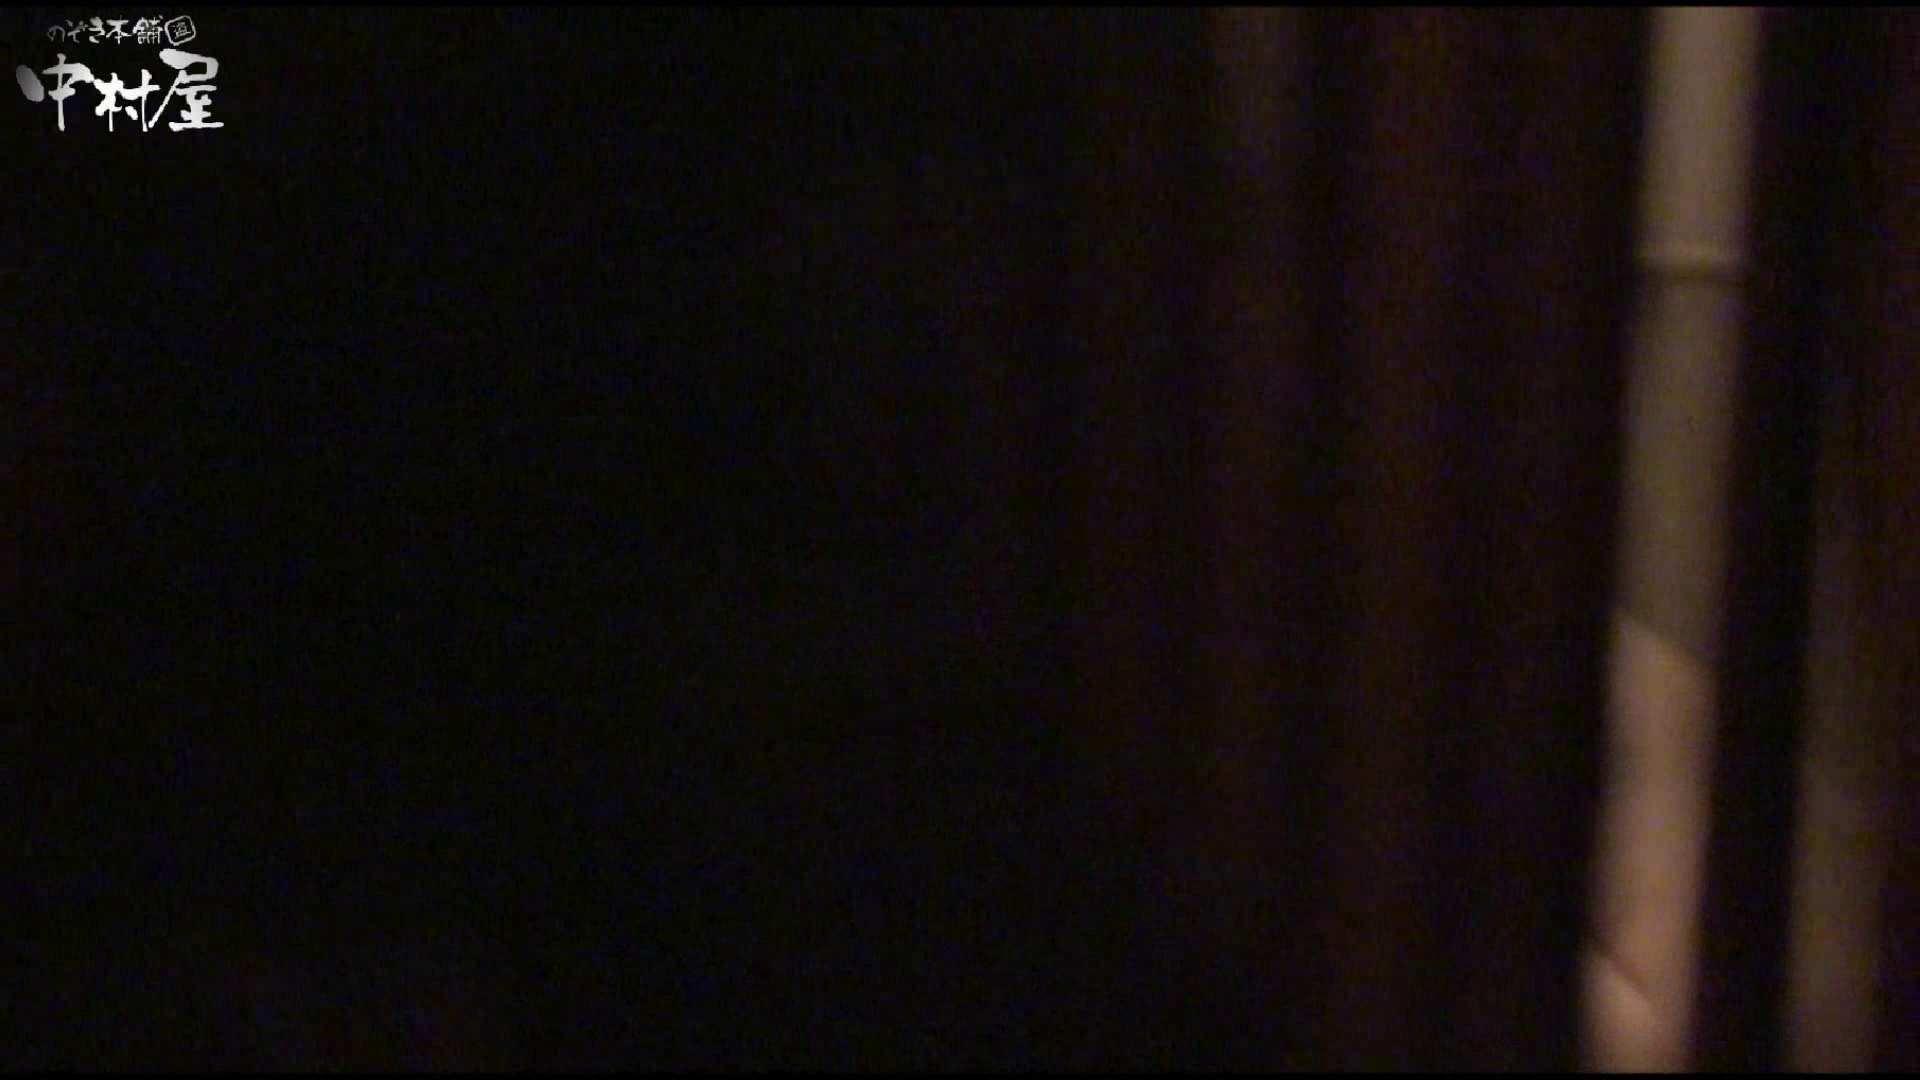 民家風呂専門盗撮師の超危険映像 vol.028 お色気美女 ヌード画像 54枚 16